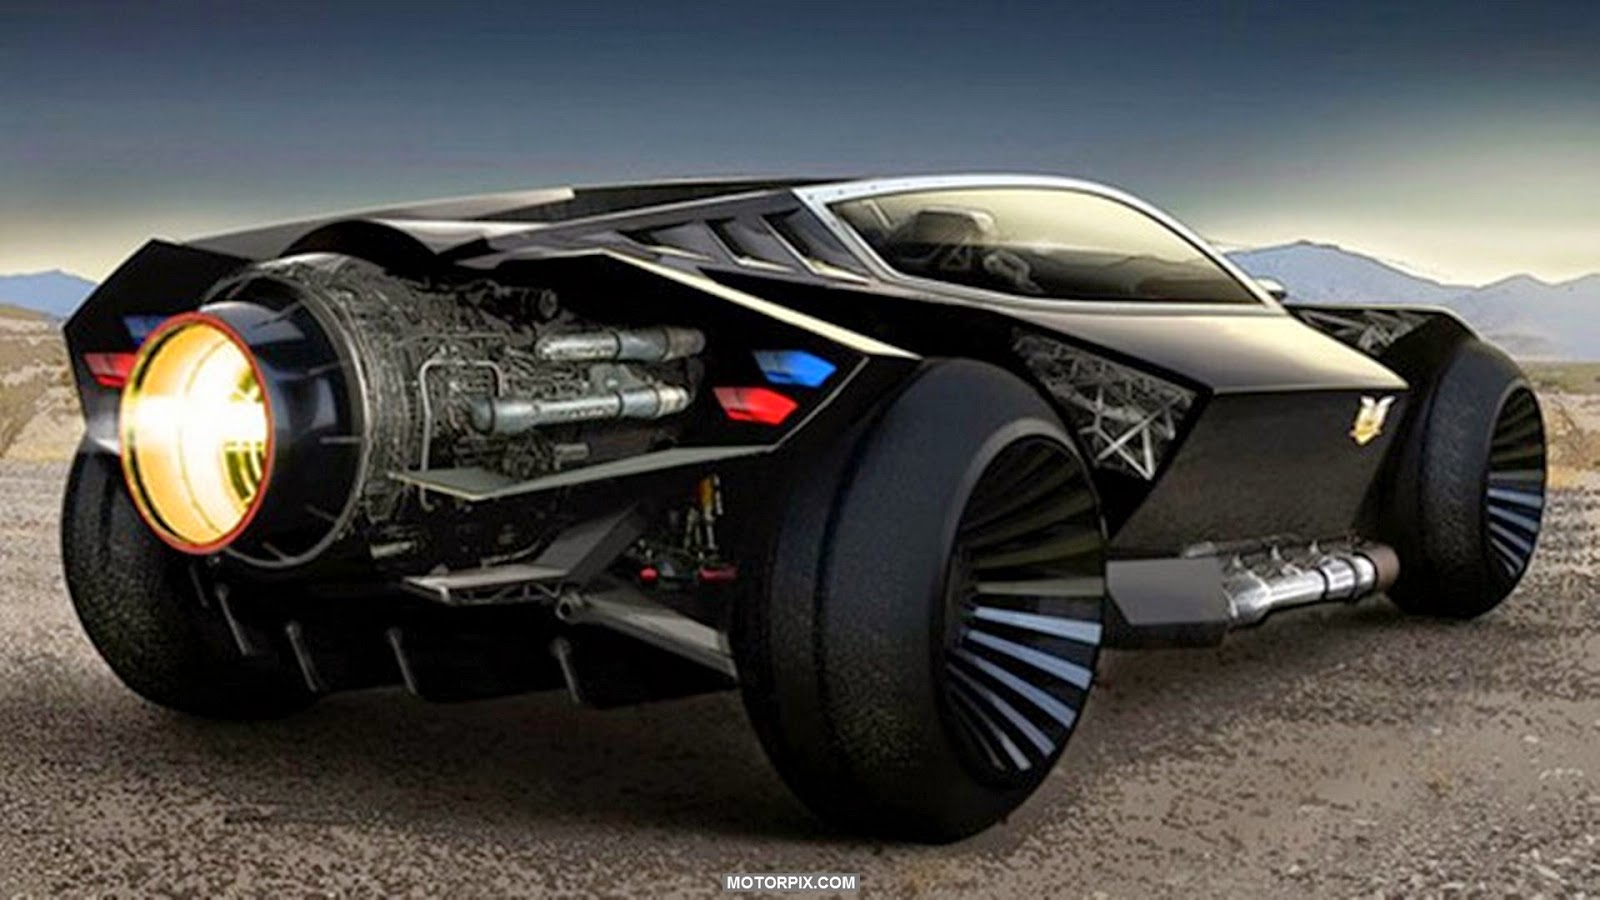 ford interceptor concept mad max car interior design. Black Bedroom Furniture Sets. Home Design Ideas